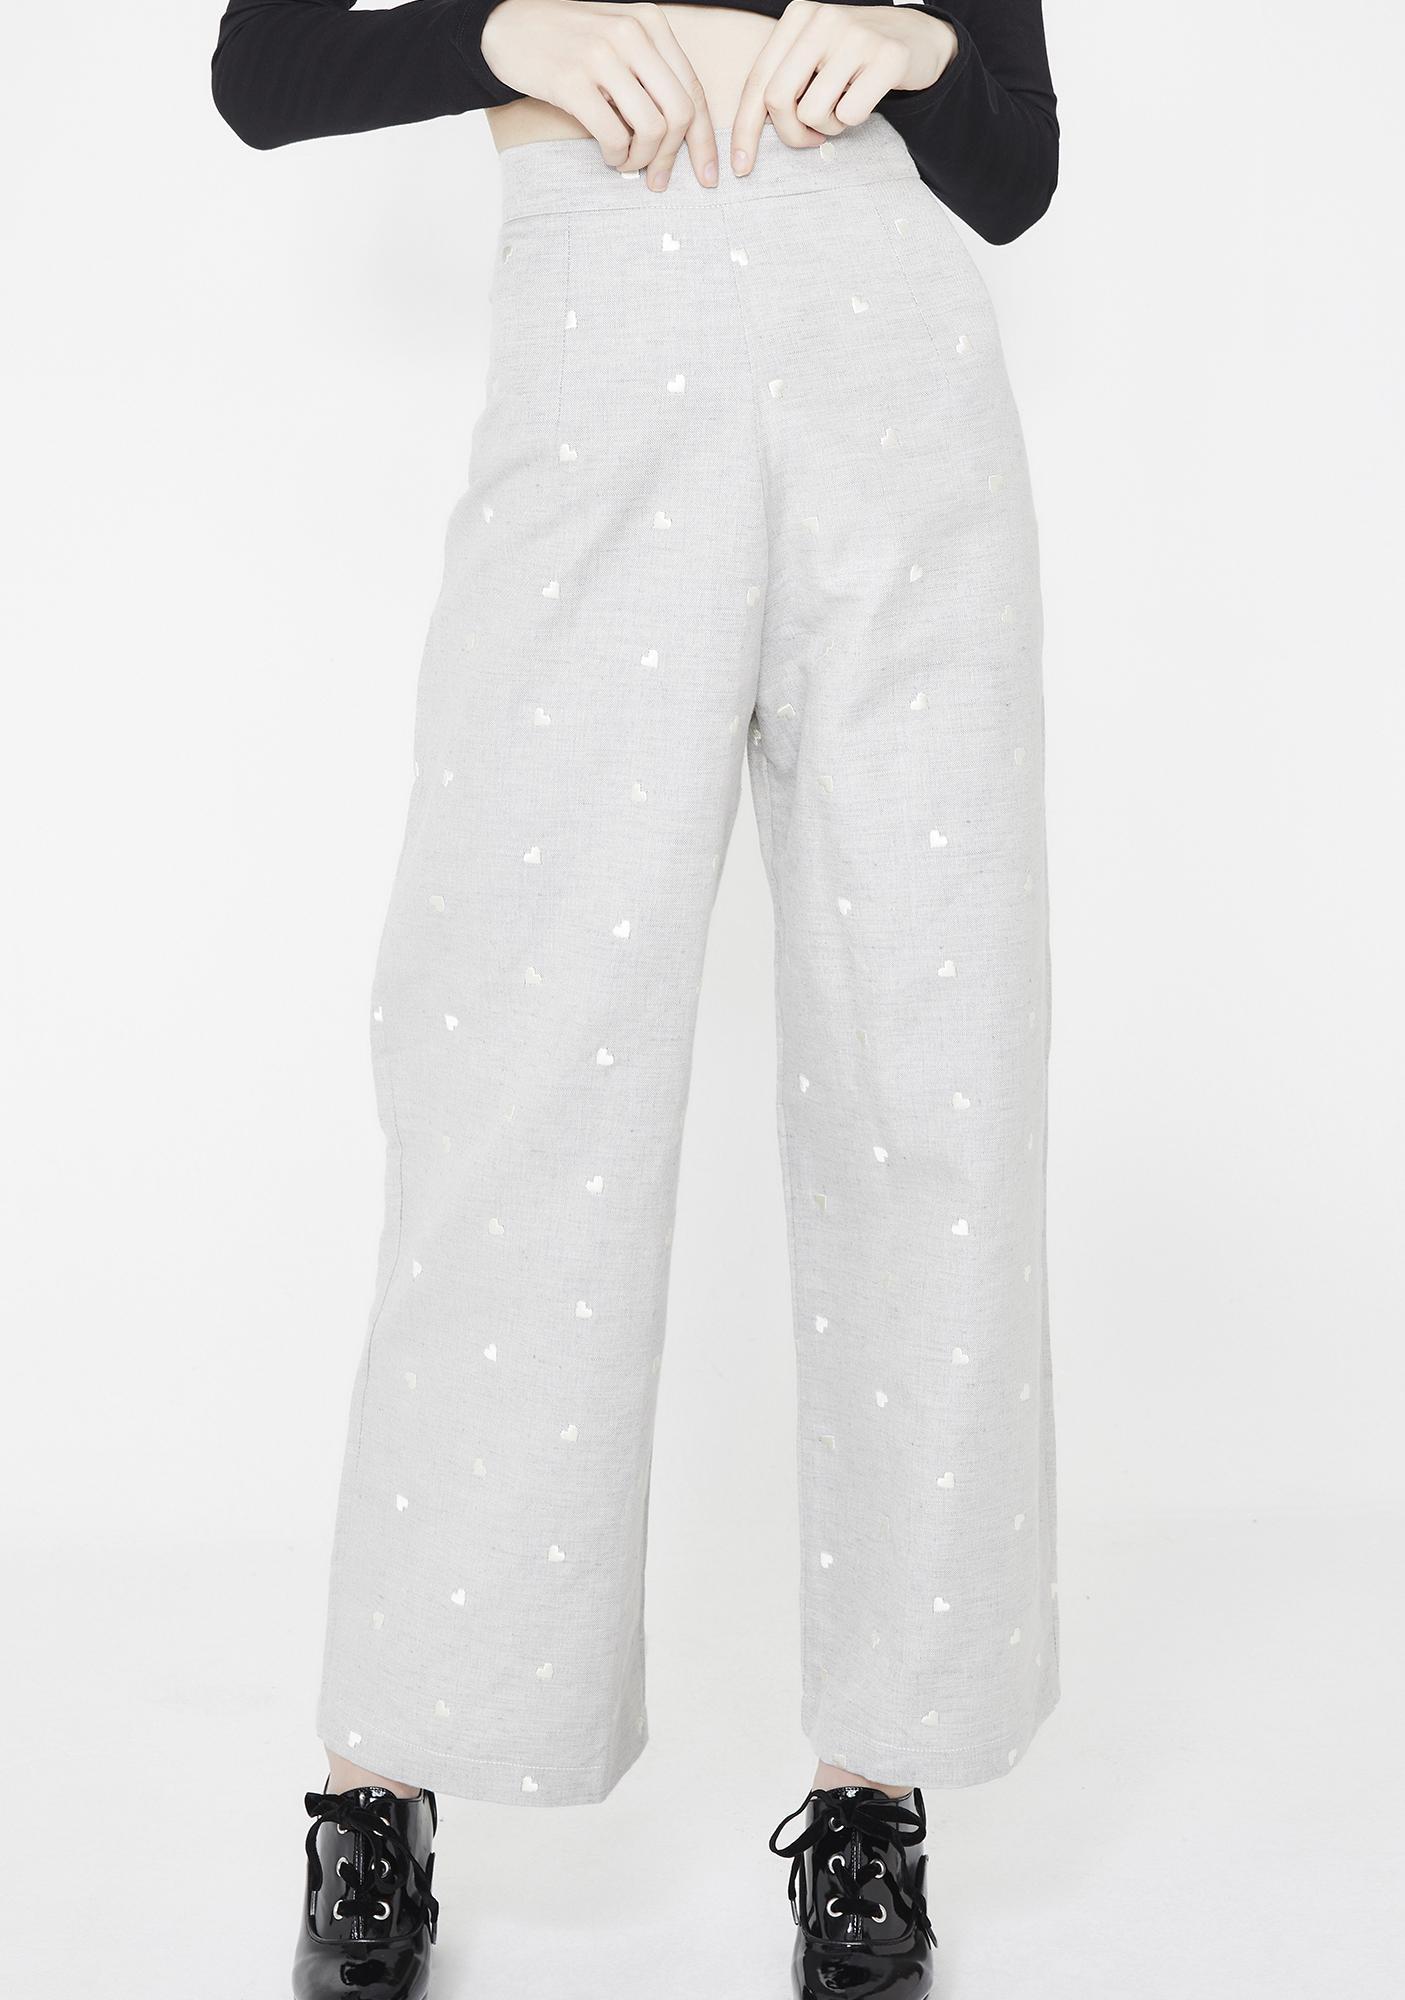 Morph8ne Gloomy Pants